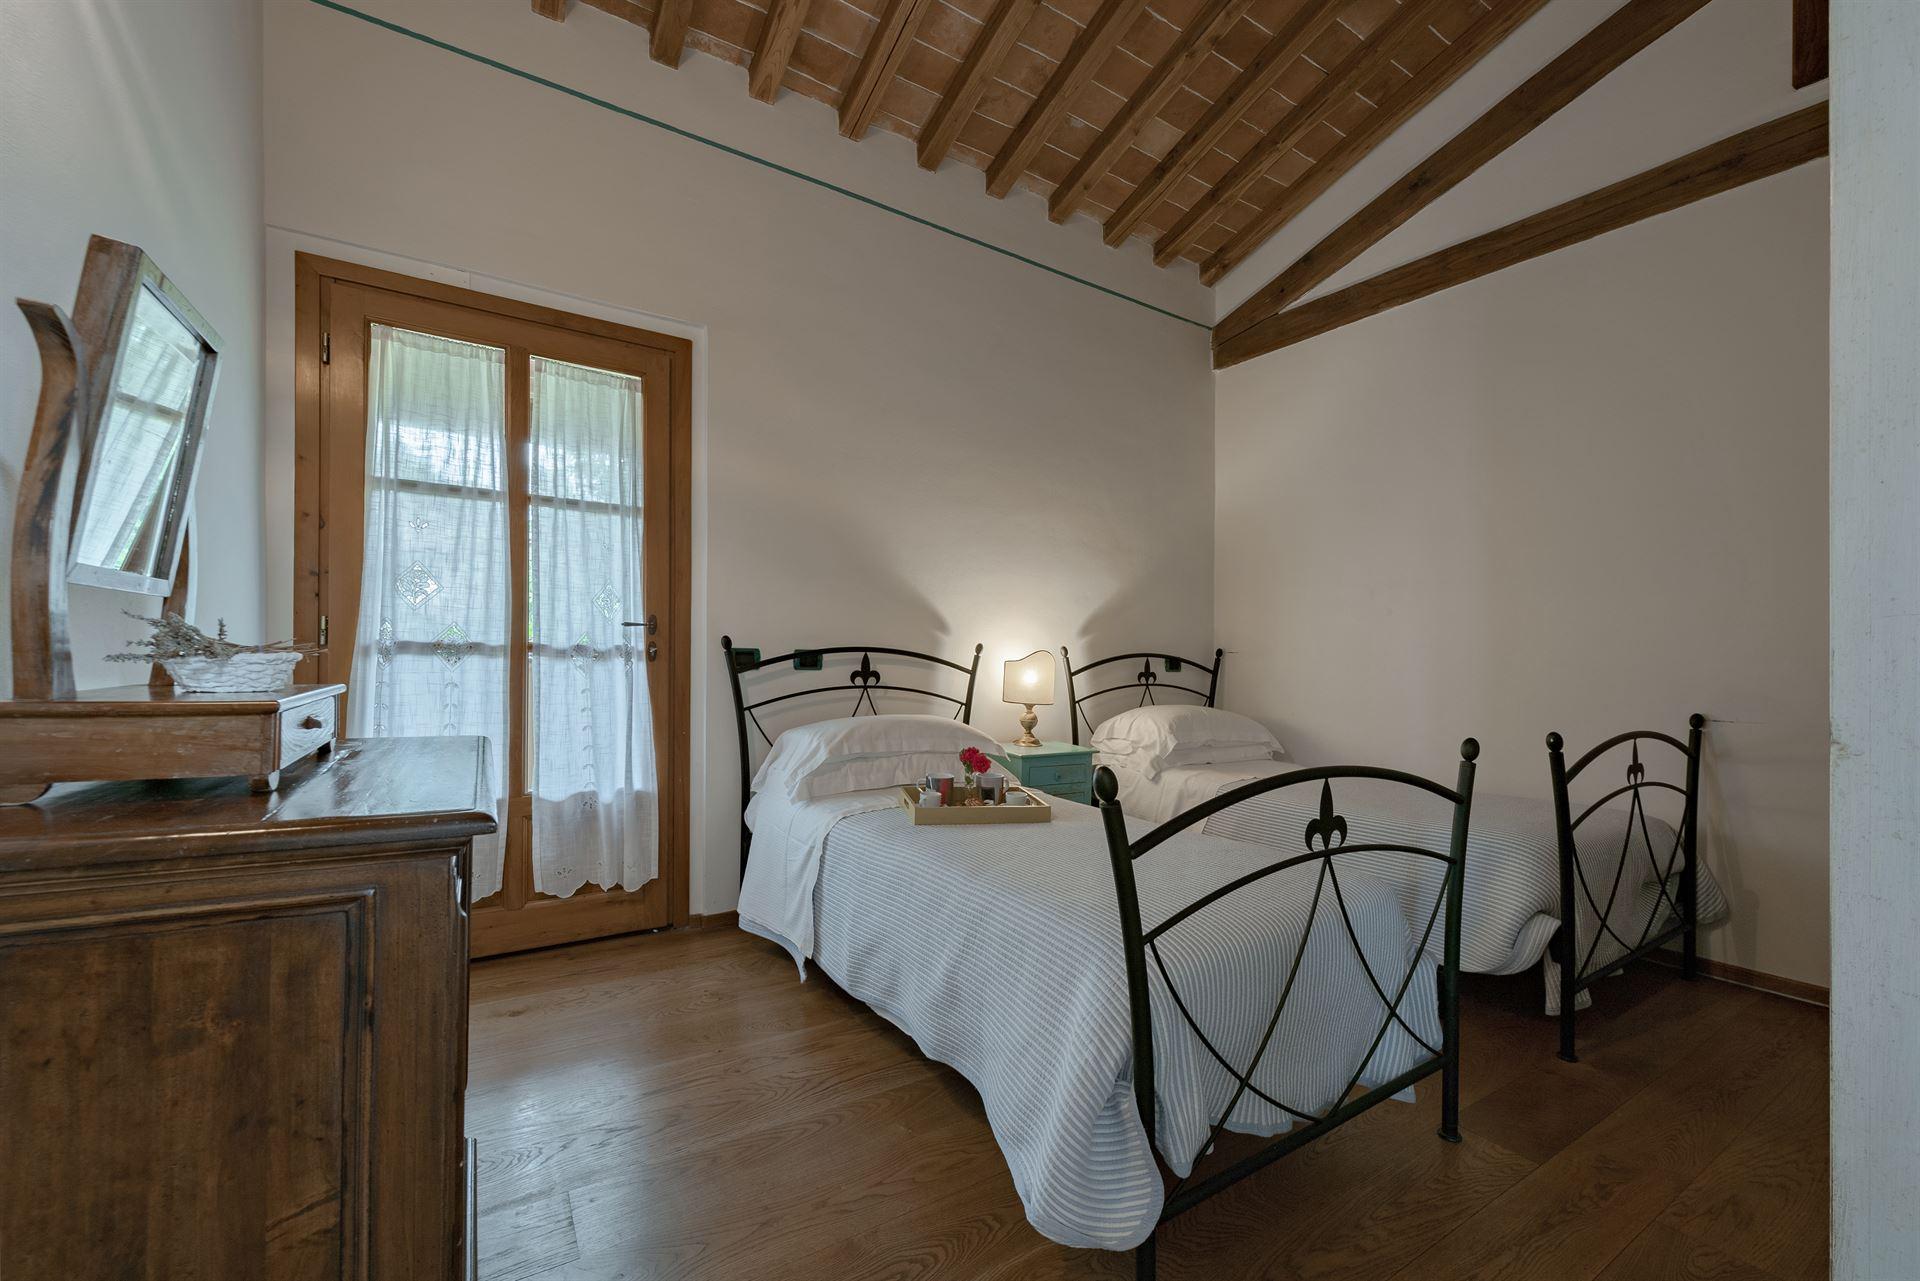 Ferienhaus Villa Sornano Toskana - Urlaub in Sornano ...